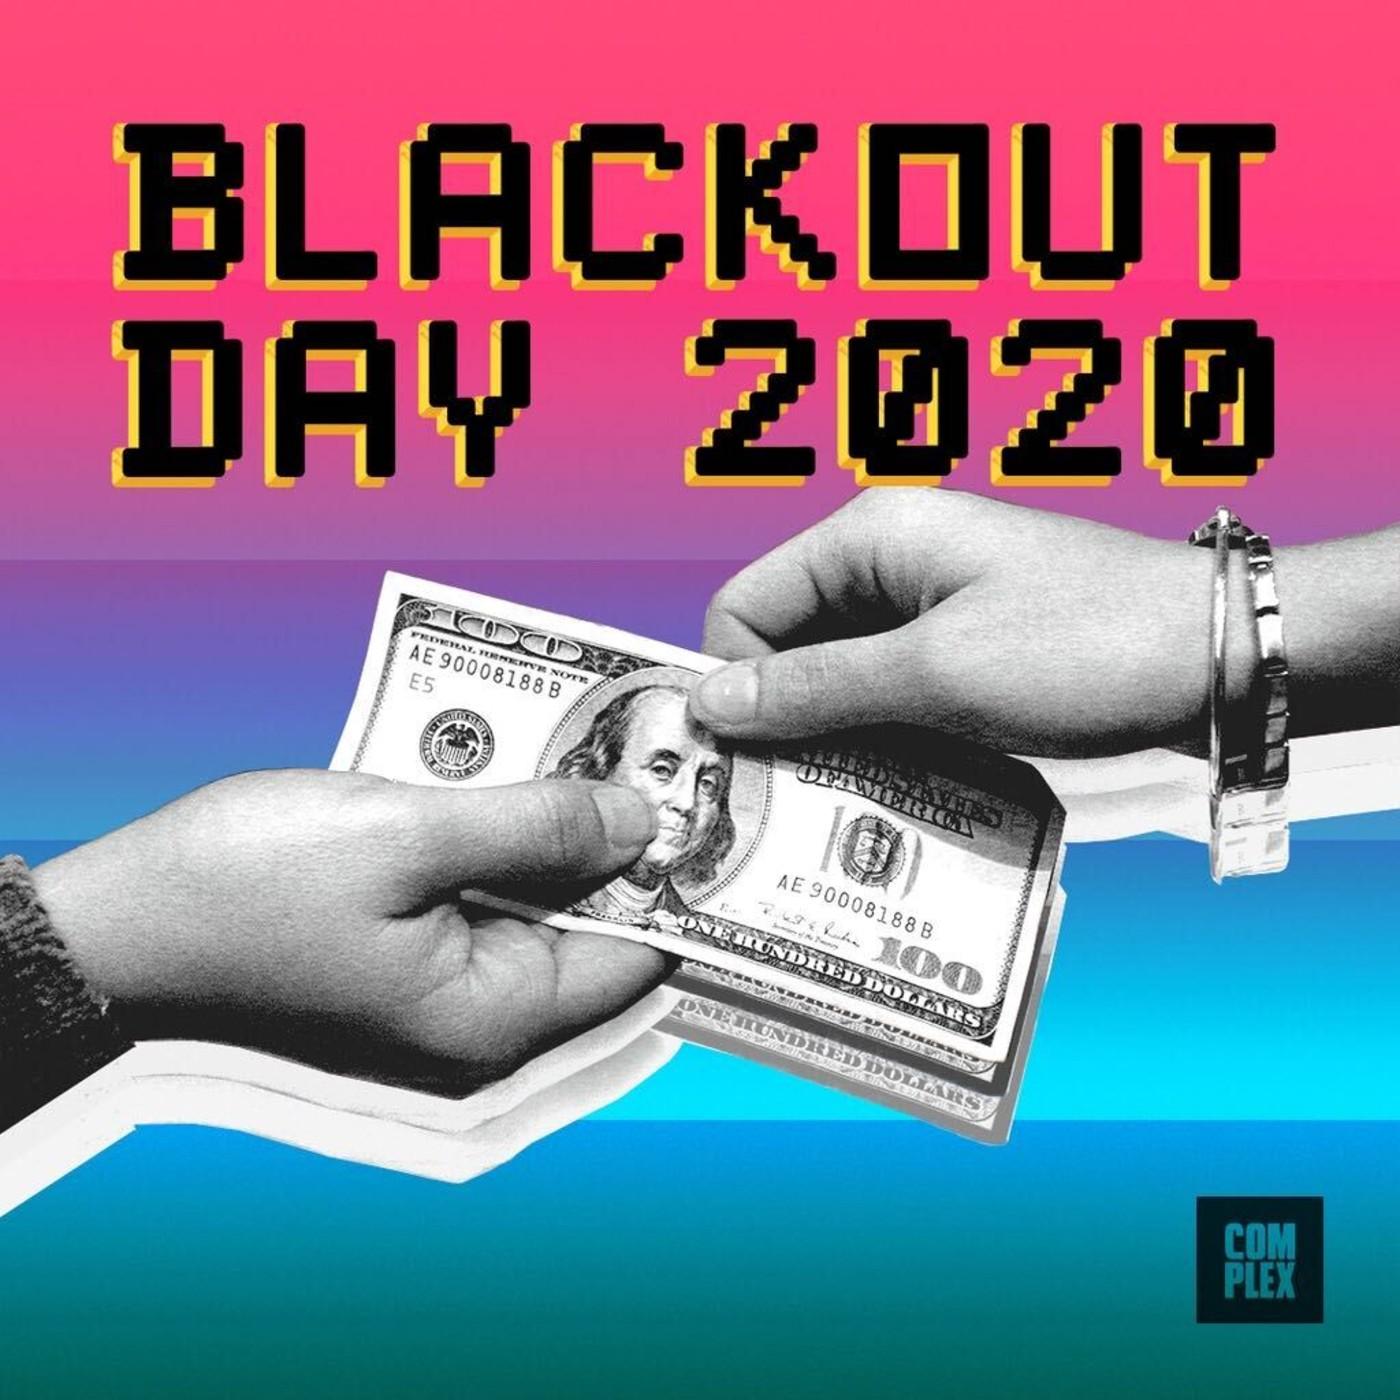 Blackout Day 2020 Explainer